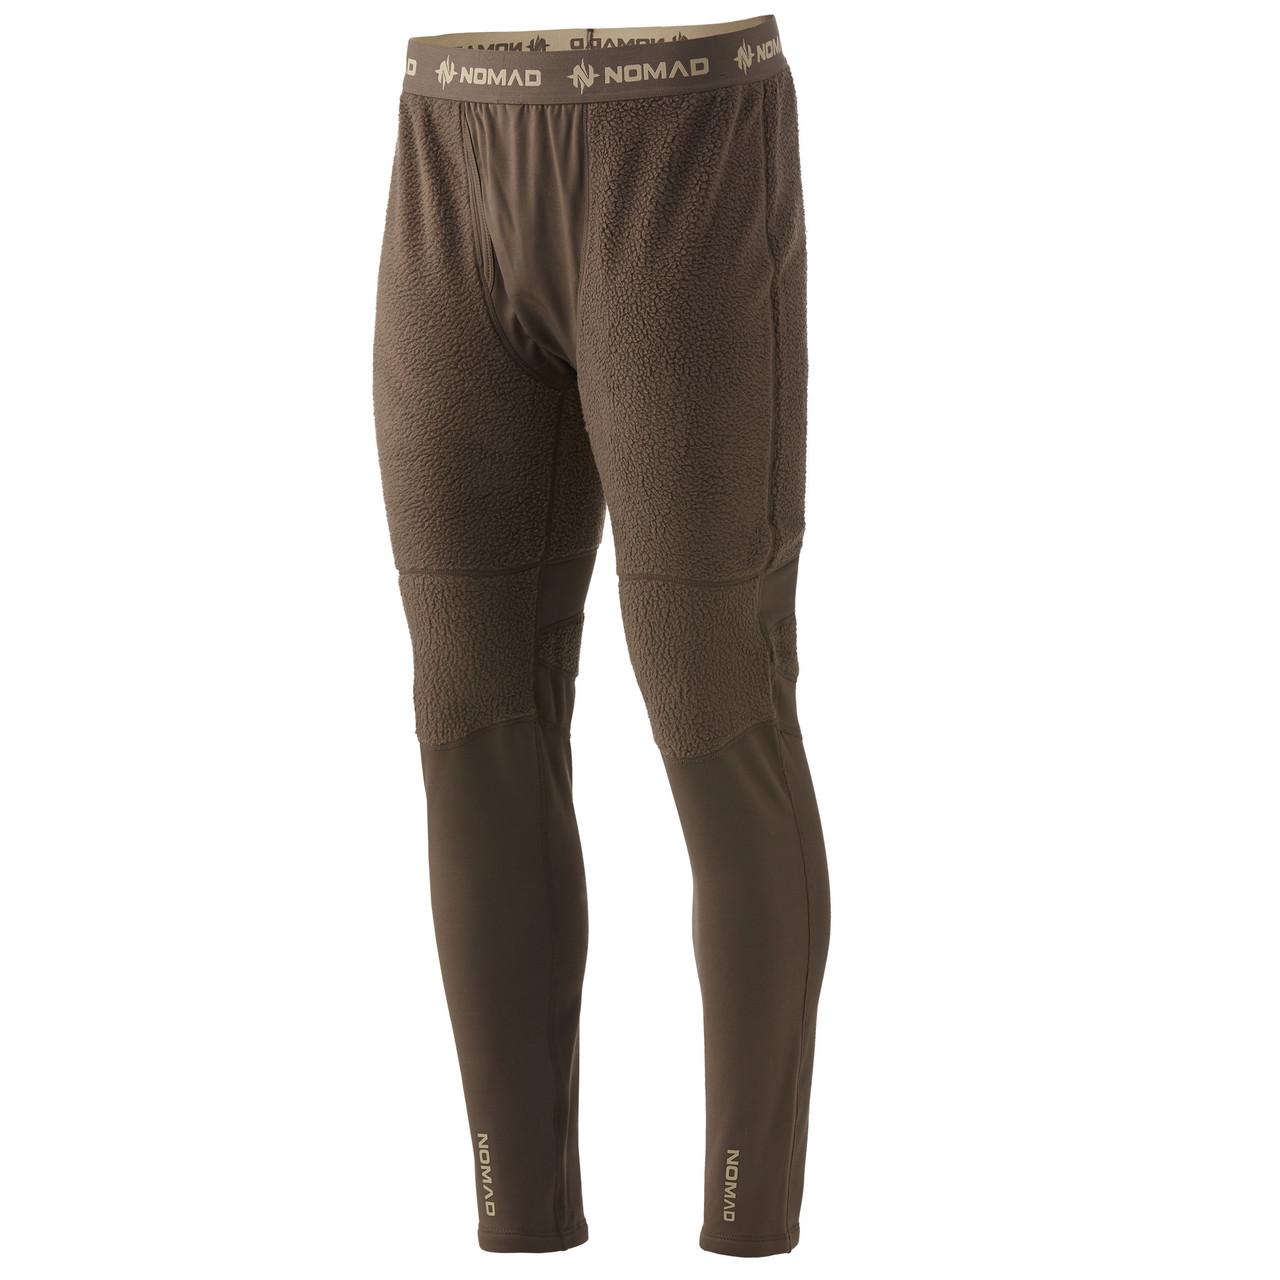 Nomad Men's Cottonwood Legging N5000023